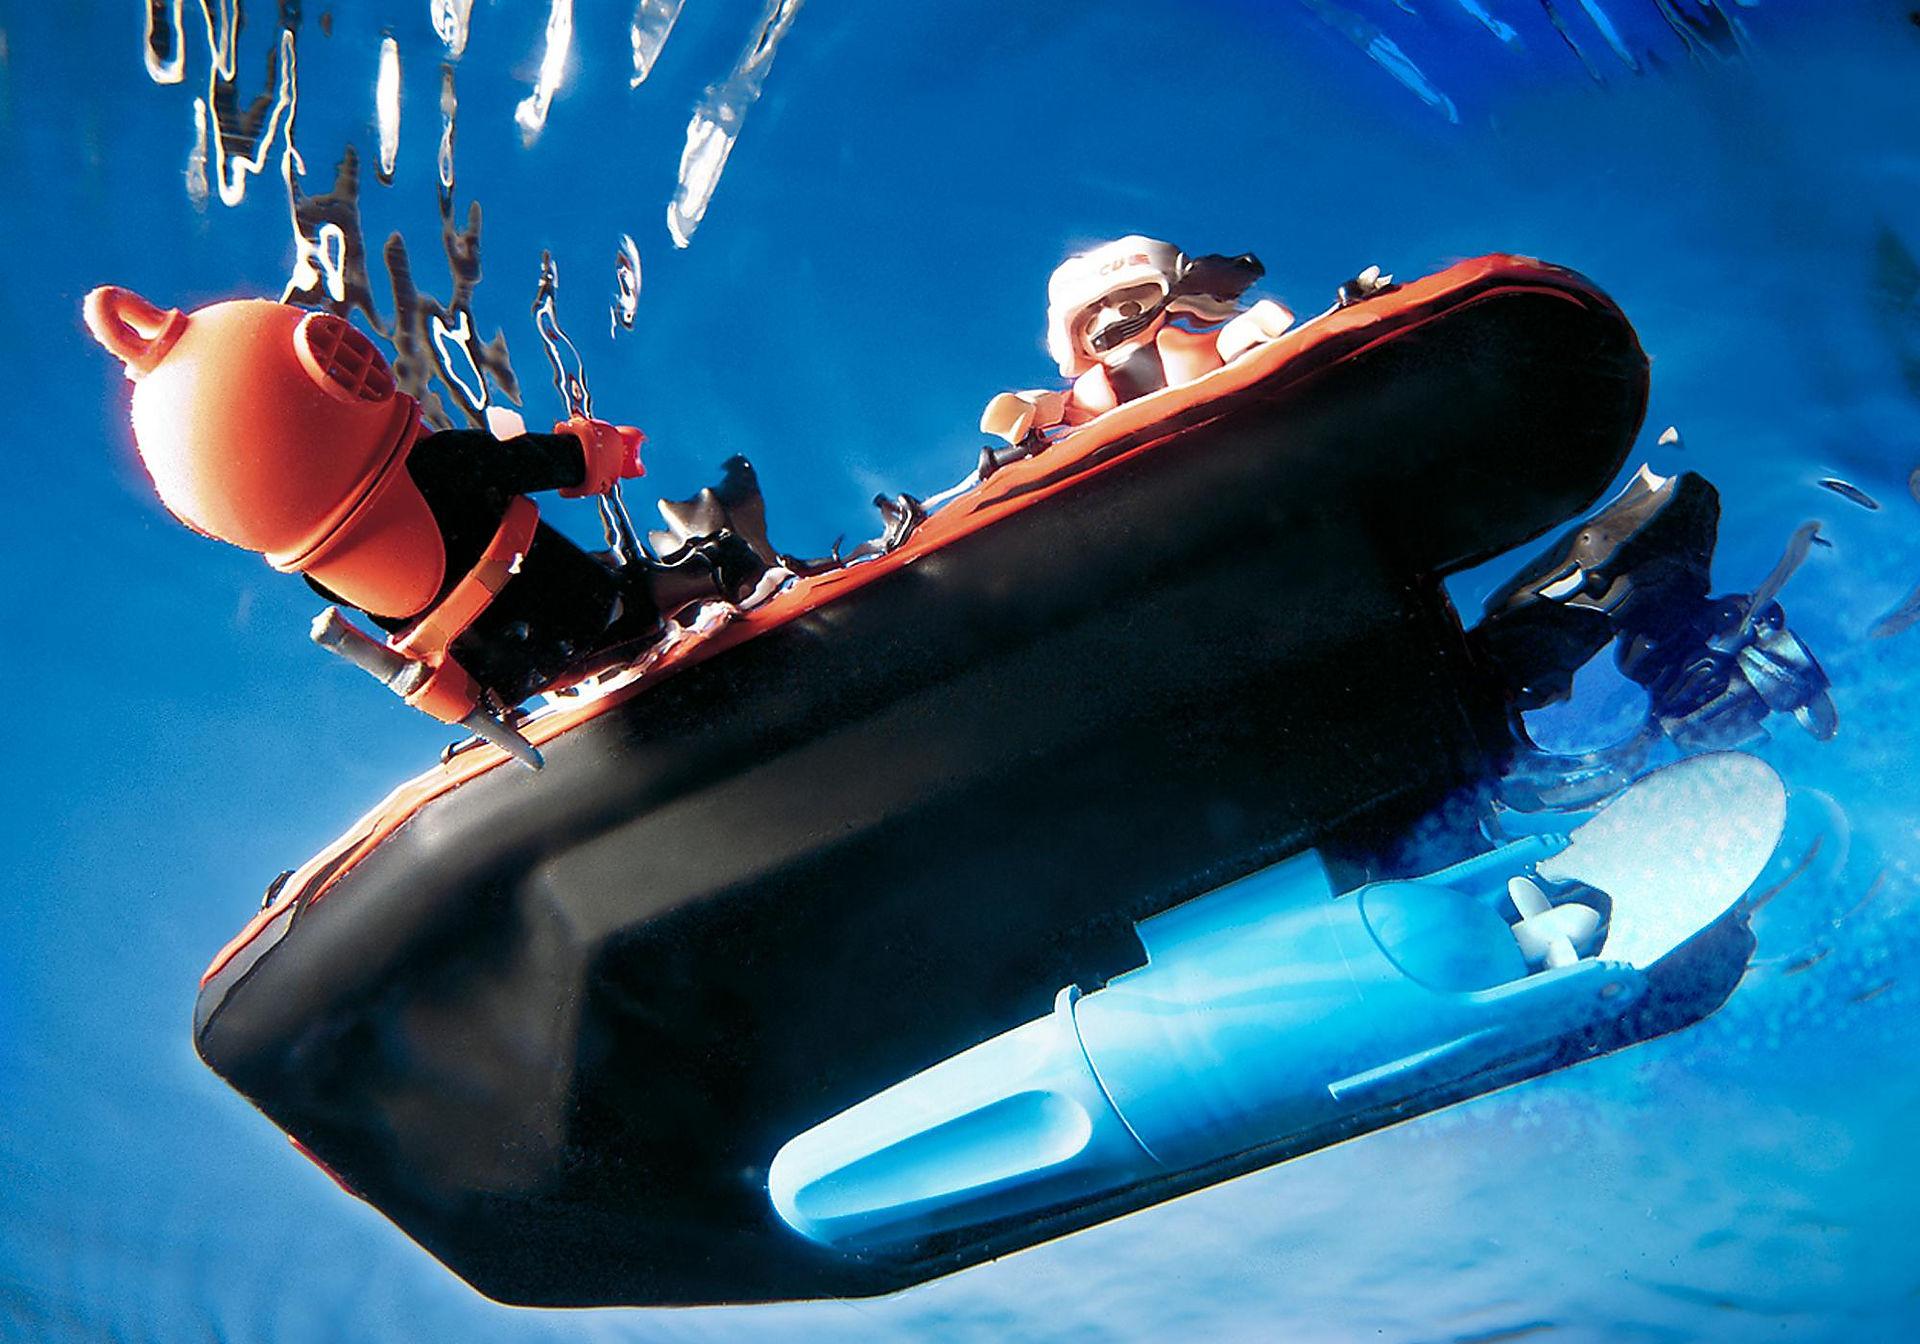 http://media.playmobil.com/i/playmobil/4428_product_extra1/SOS-Helikopter/Rettungsboot